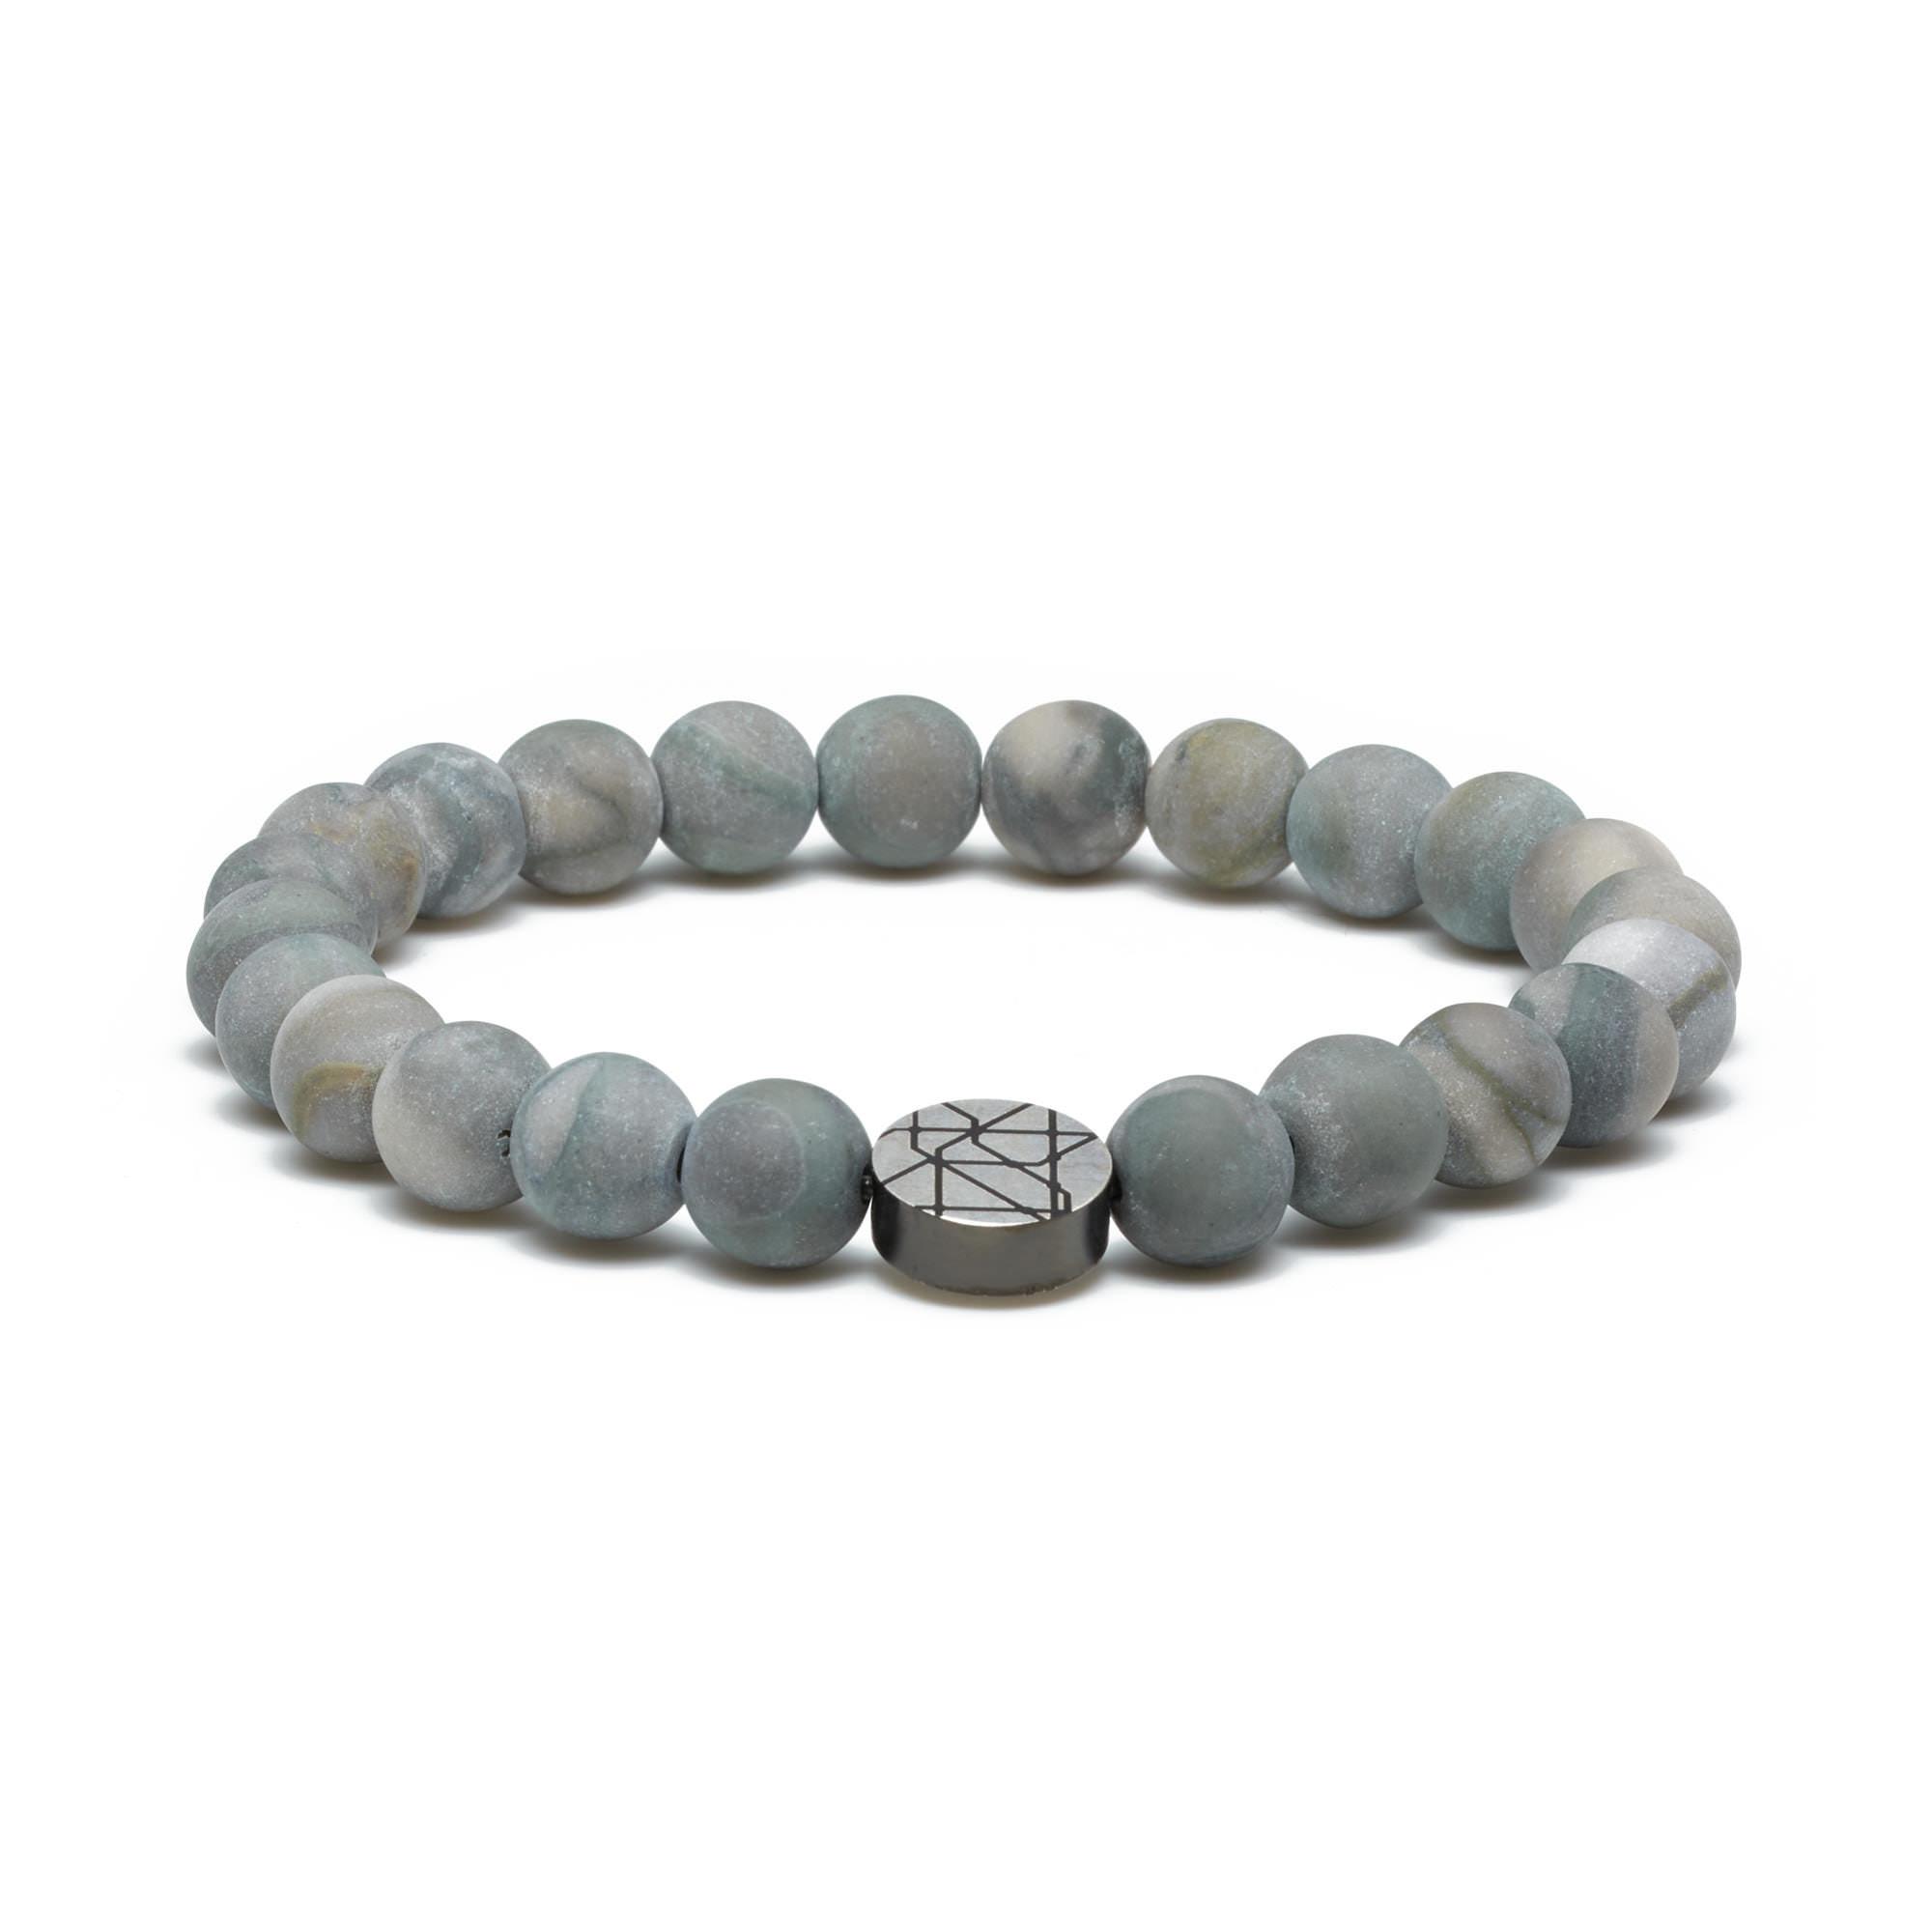 Sem Lewis Piccadilly South Kensington braccialetto di perline grigio